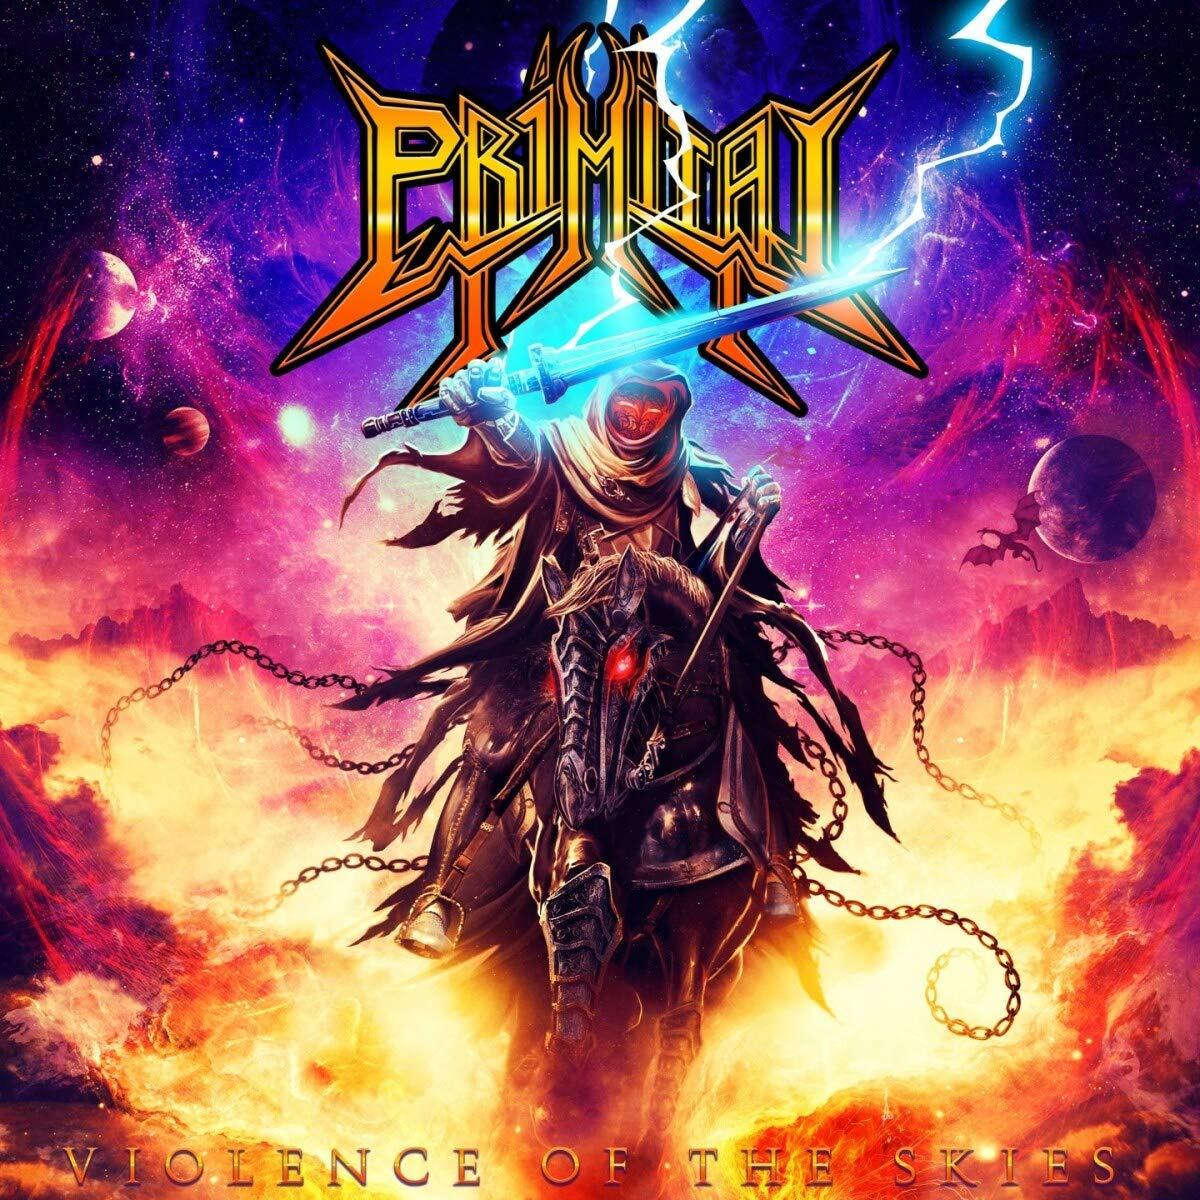 Primitai - Violence Of The Skies (2021) [FLAC] Download